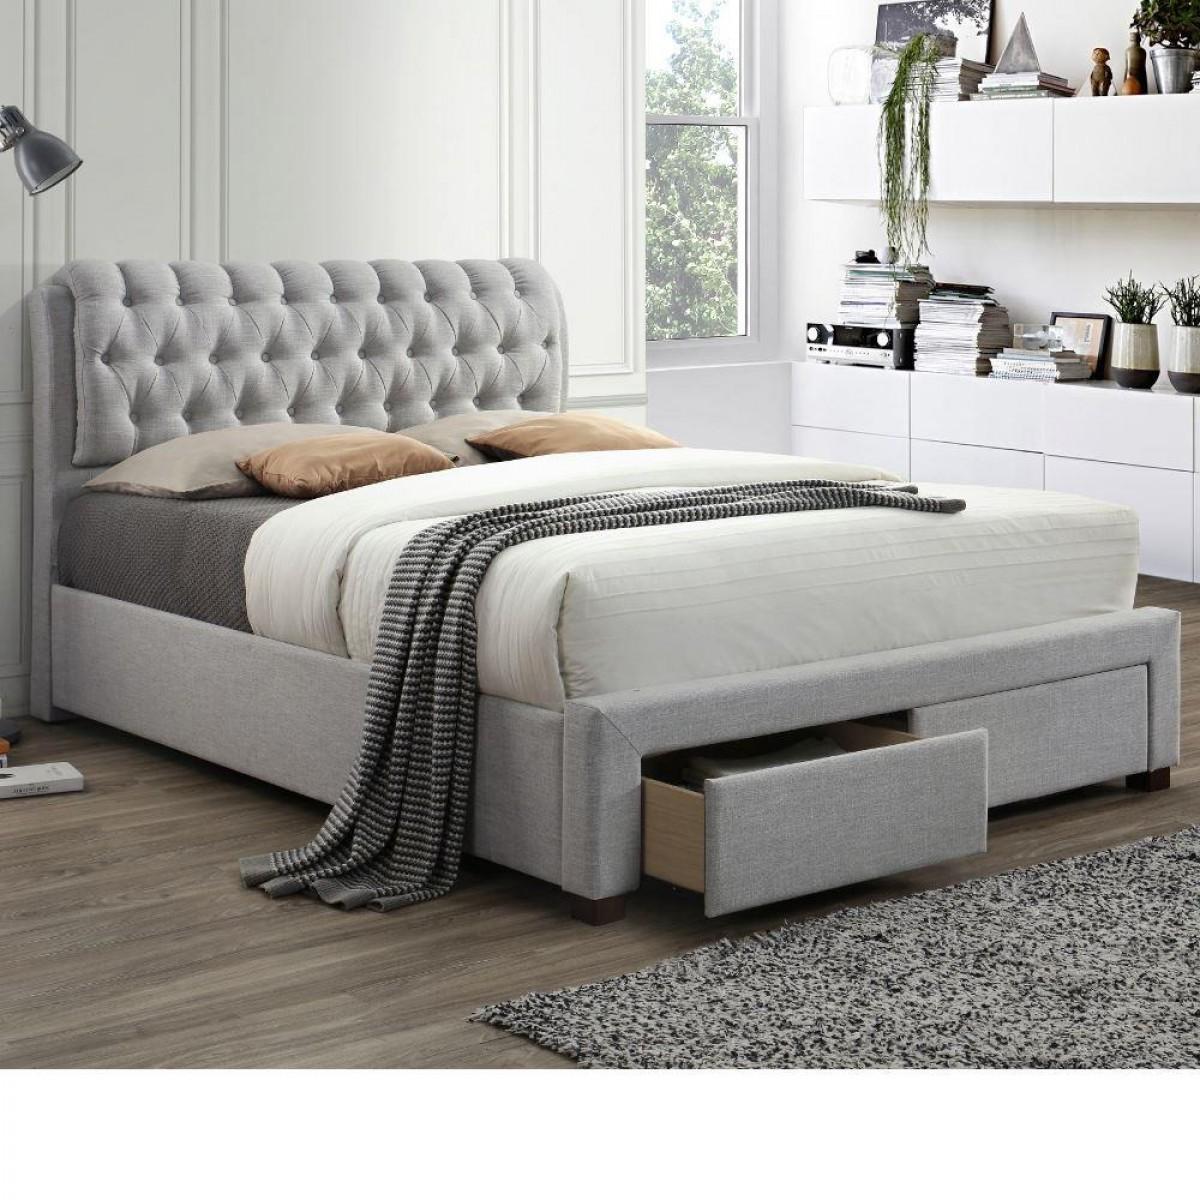 Valentino Light Dove Grey Fabric 2 Drawer Storage Bed